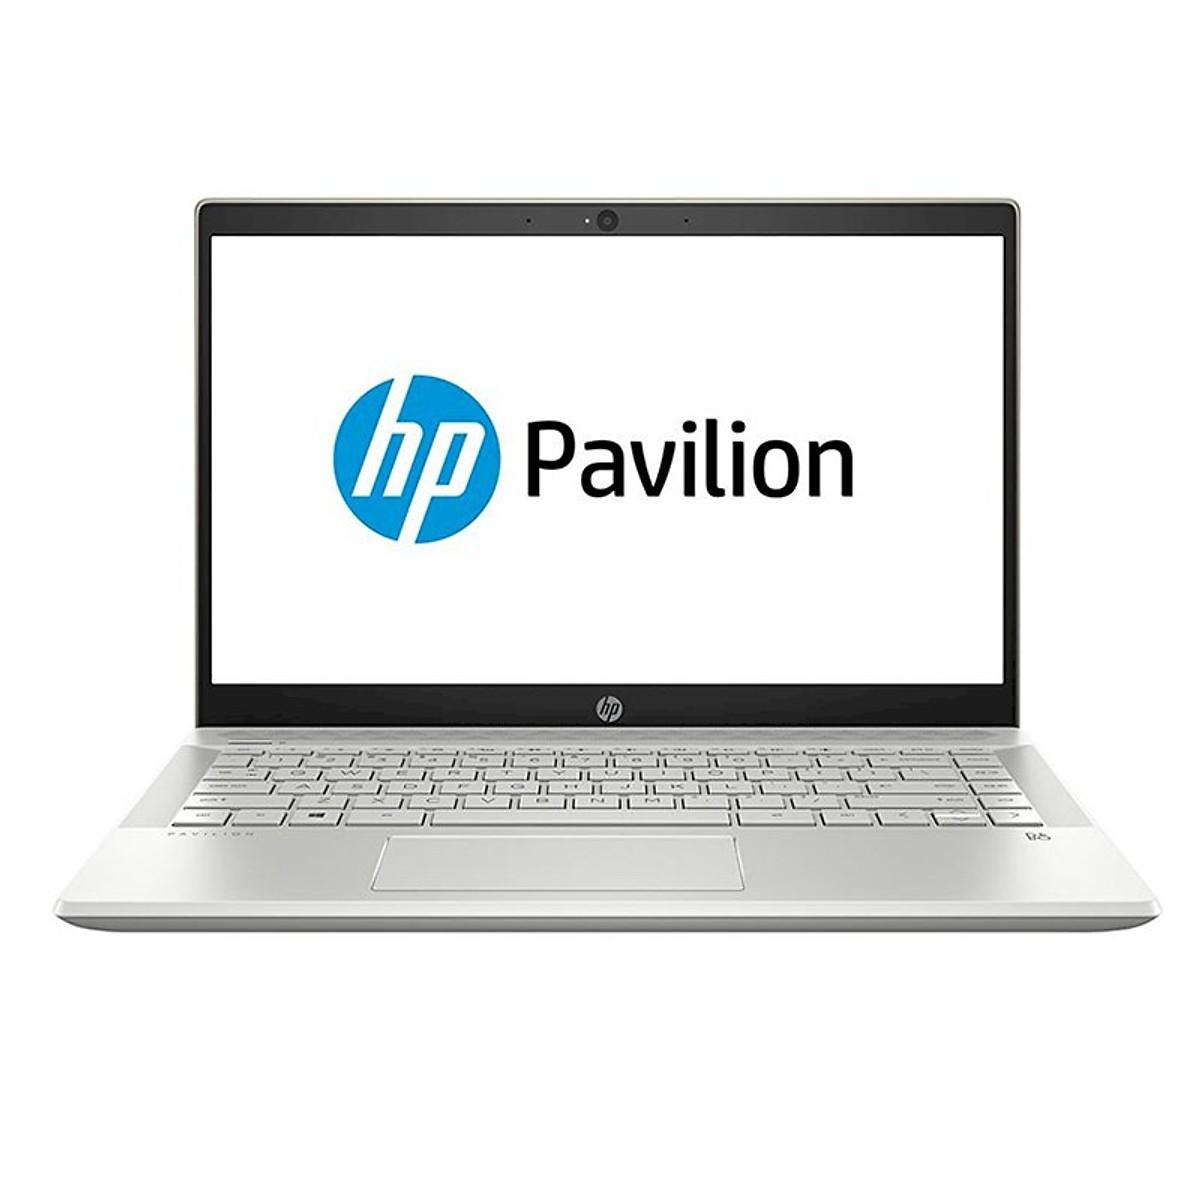 Laptop HP Pavilion 14-e2036TU 6YZ19PA (i3-8145U/4Gb/500Gb HDD/14FHD/VGA ON/Win10/Gold)